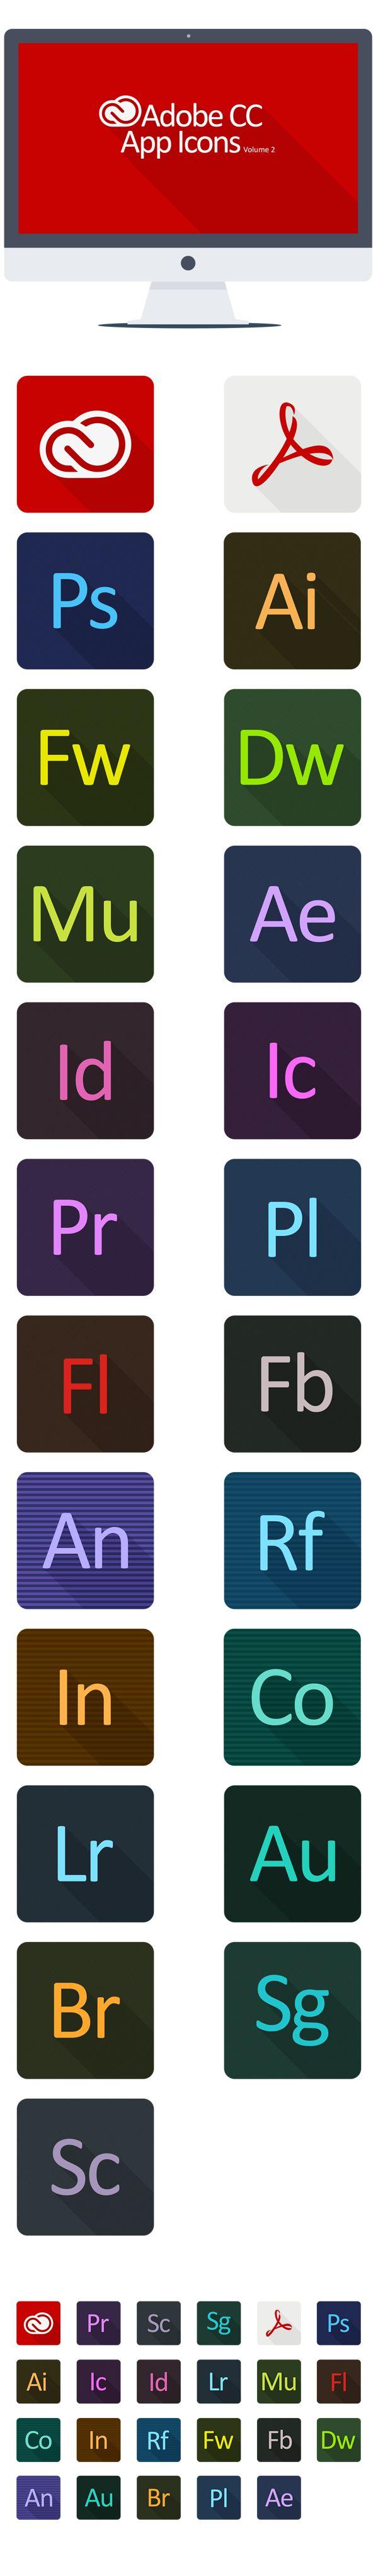 Adobe CC App Icons Volume 2 by KPL Designs , via Behance